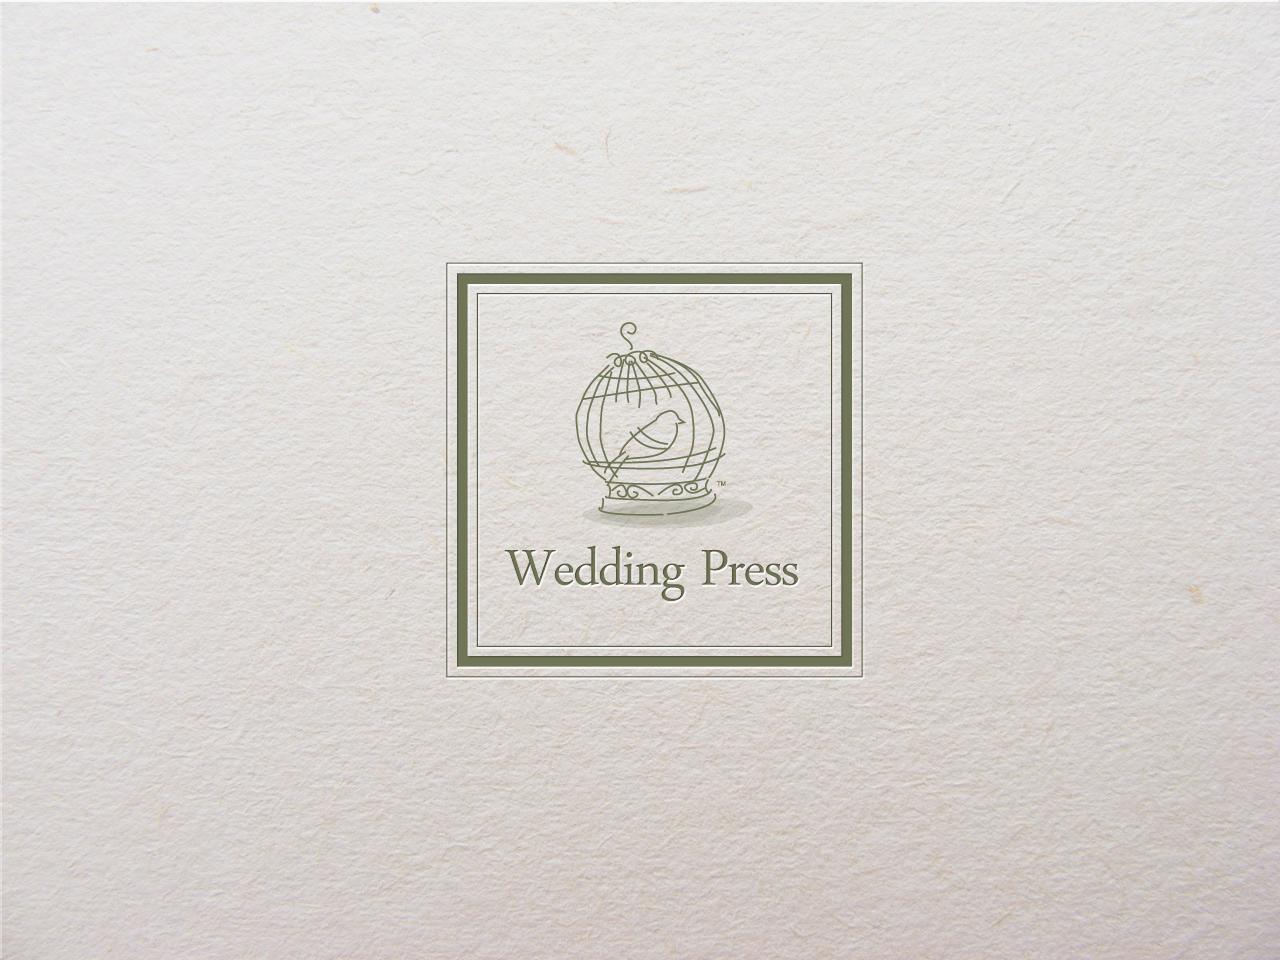 Logo Design by jpbituin - Entry No. 41 in the Logo Design Contest Wedding Writes Logo Design.